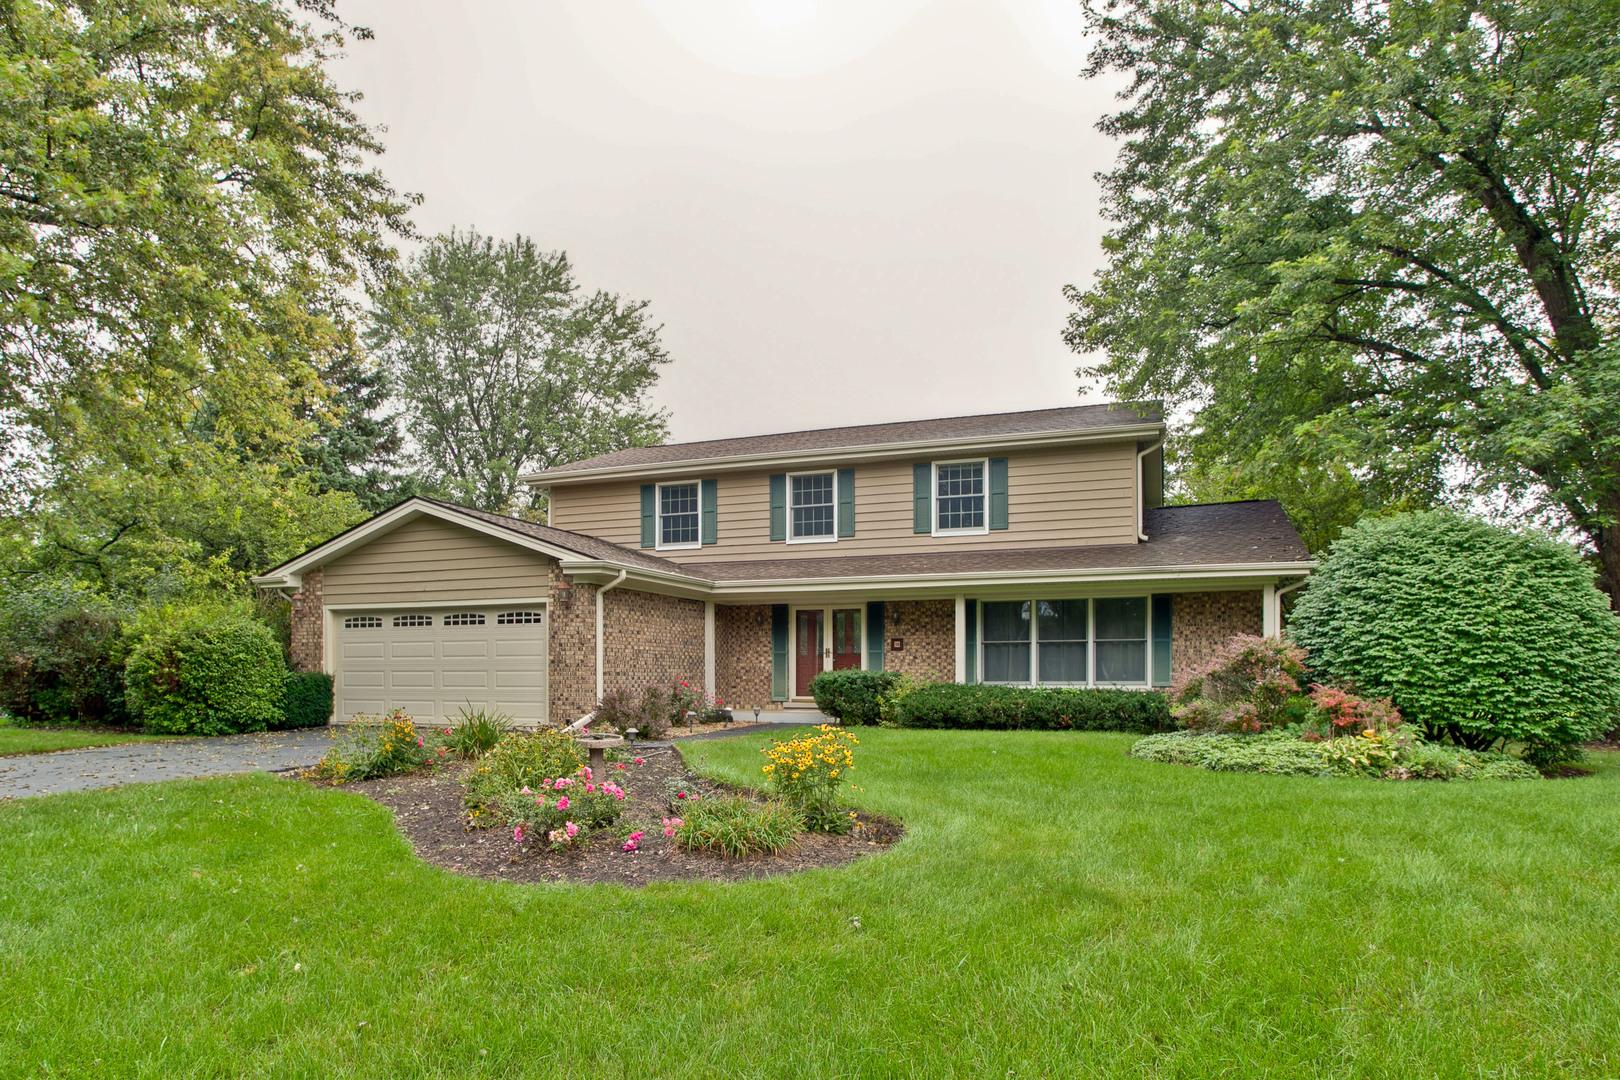 2540 Shenandoah Lane, Long Grove, Illinois 60047